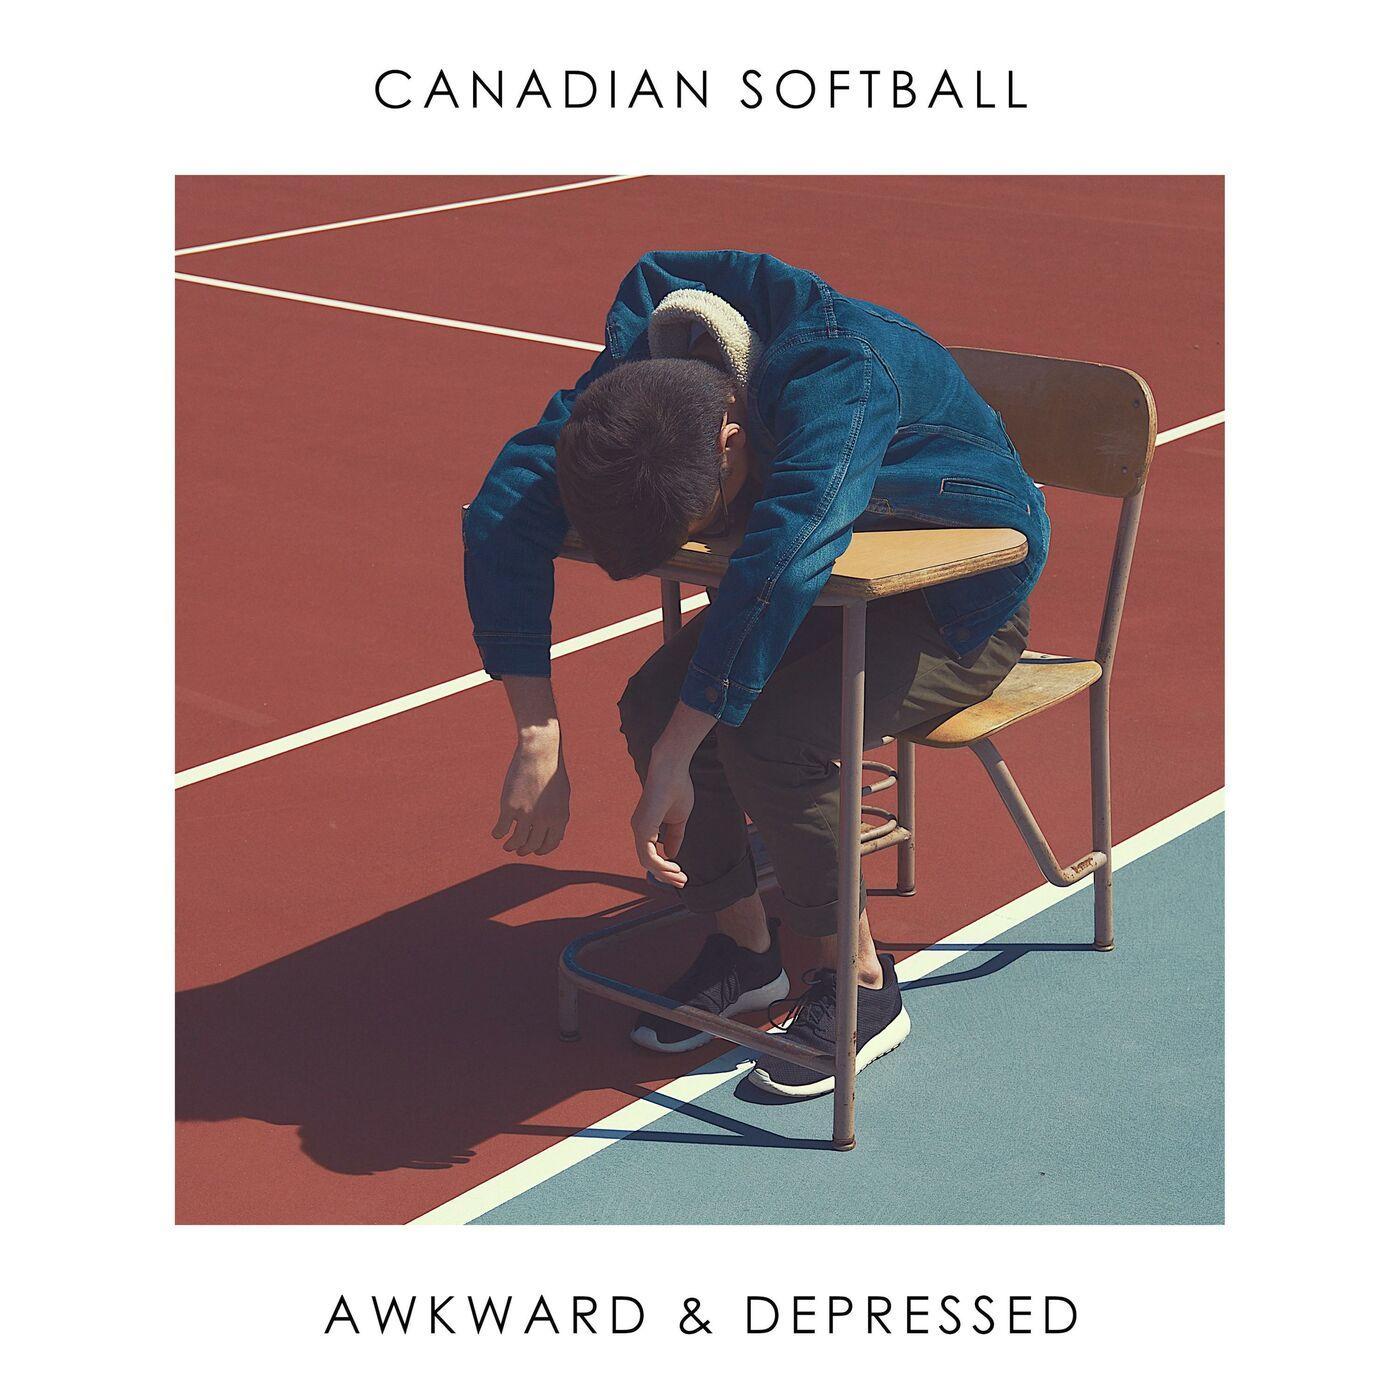 Canadian Softball - Awkward & Depressed (2017)